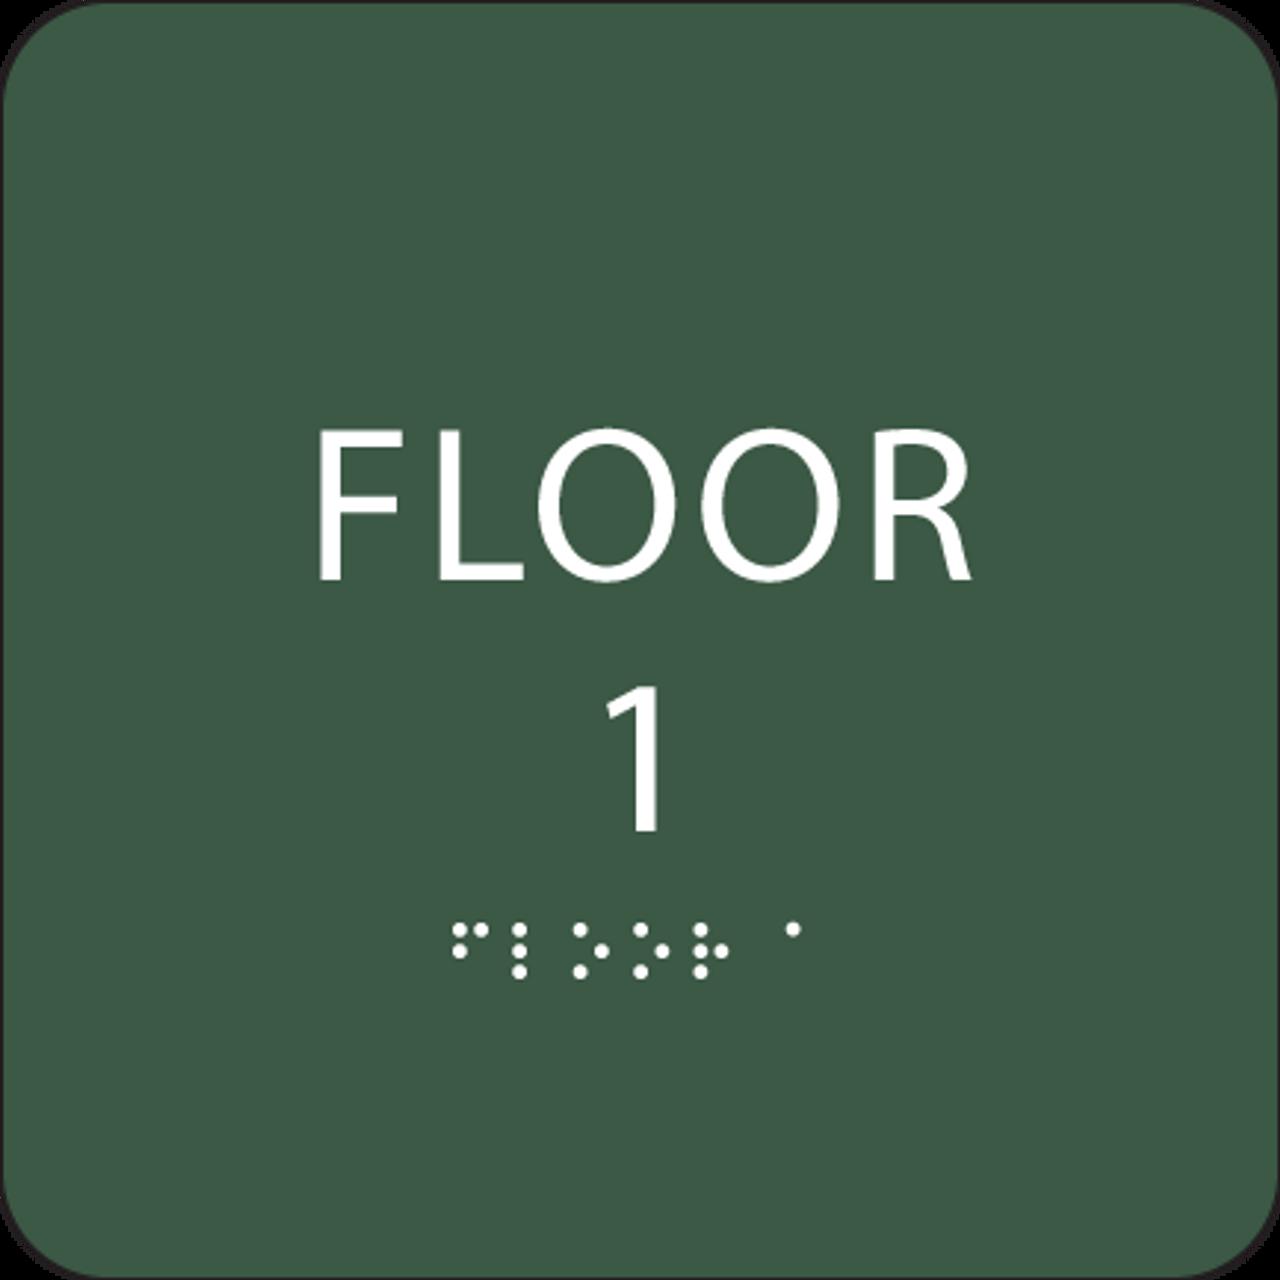 Green Floor 1 Identification ADA Sign